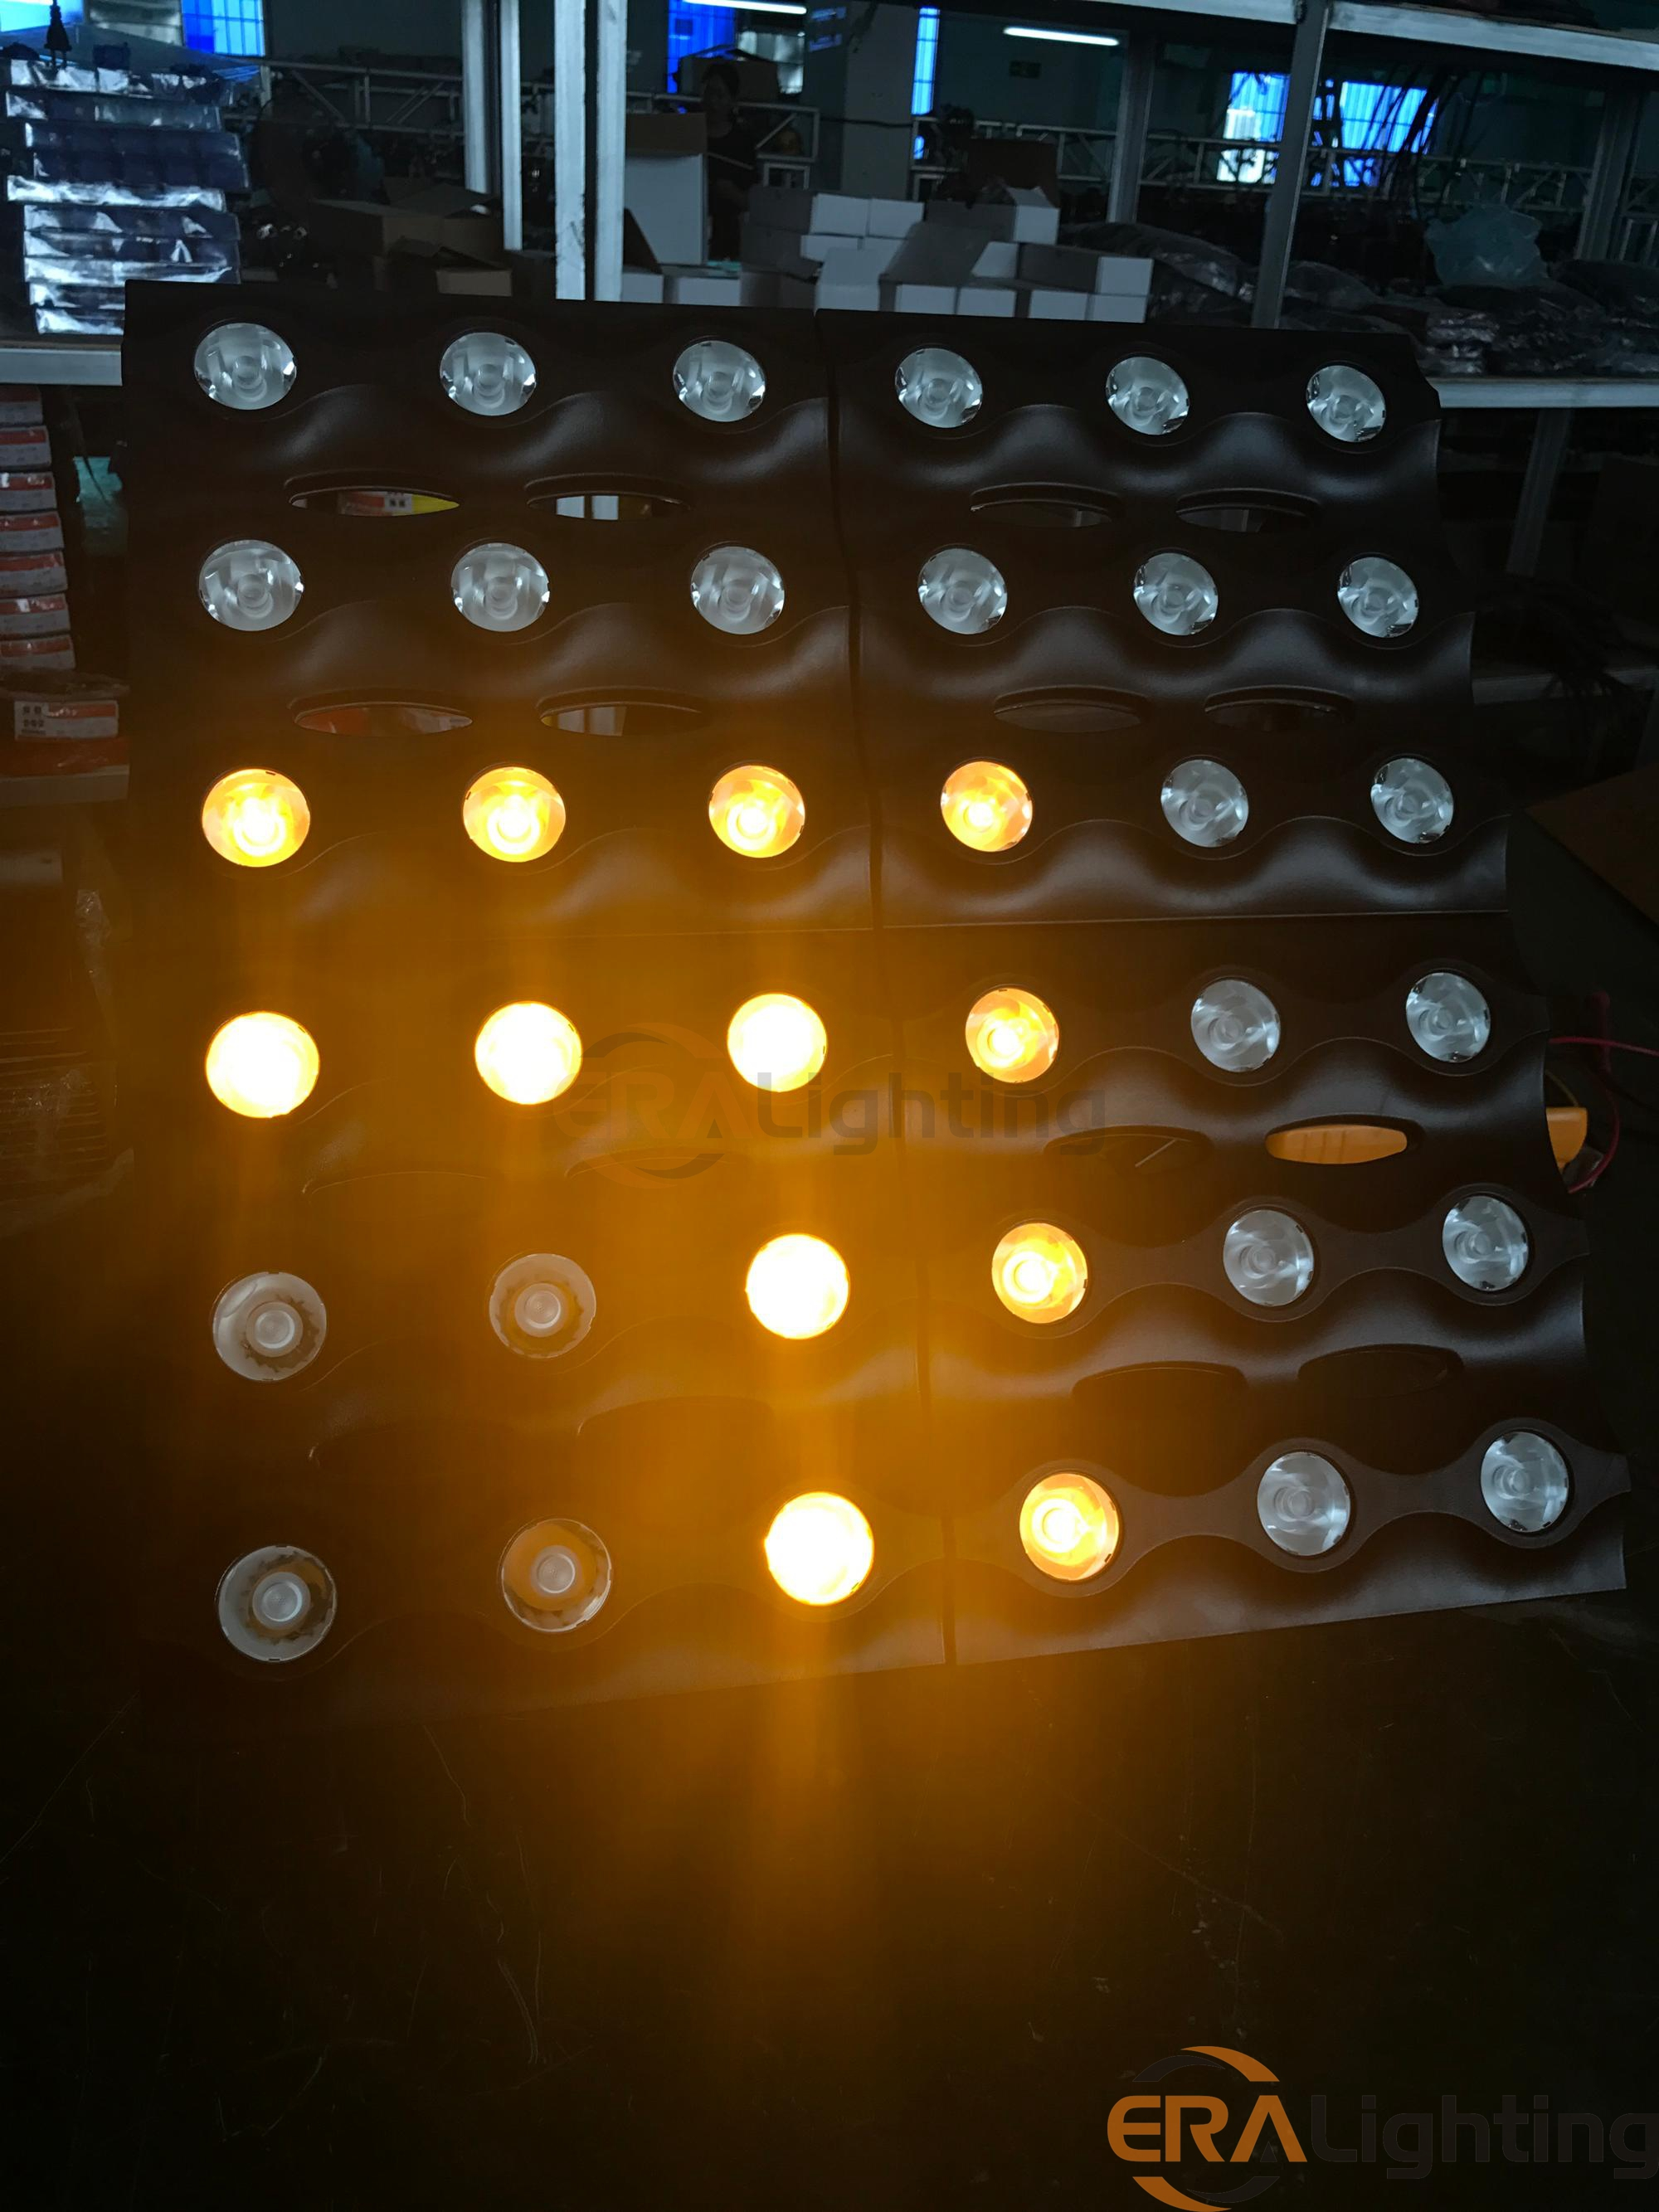 6x6 36x3w Led Golden Matrix Panel Beam Blinder Light Era